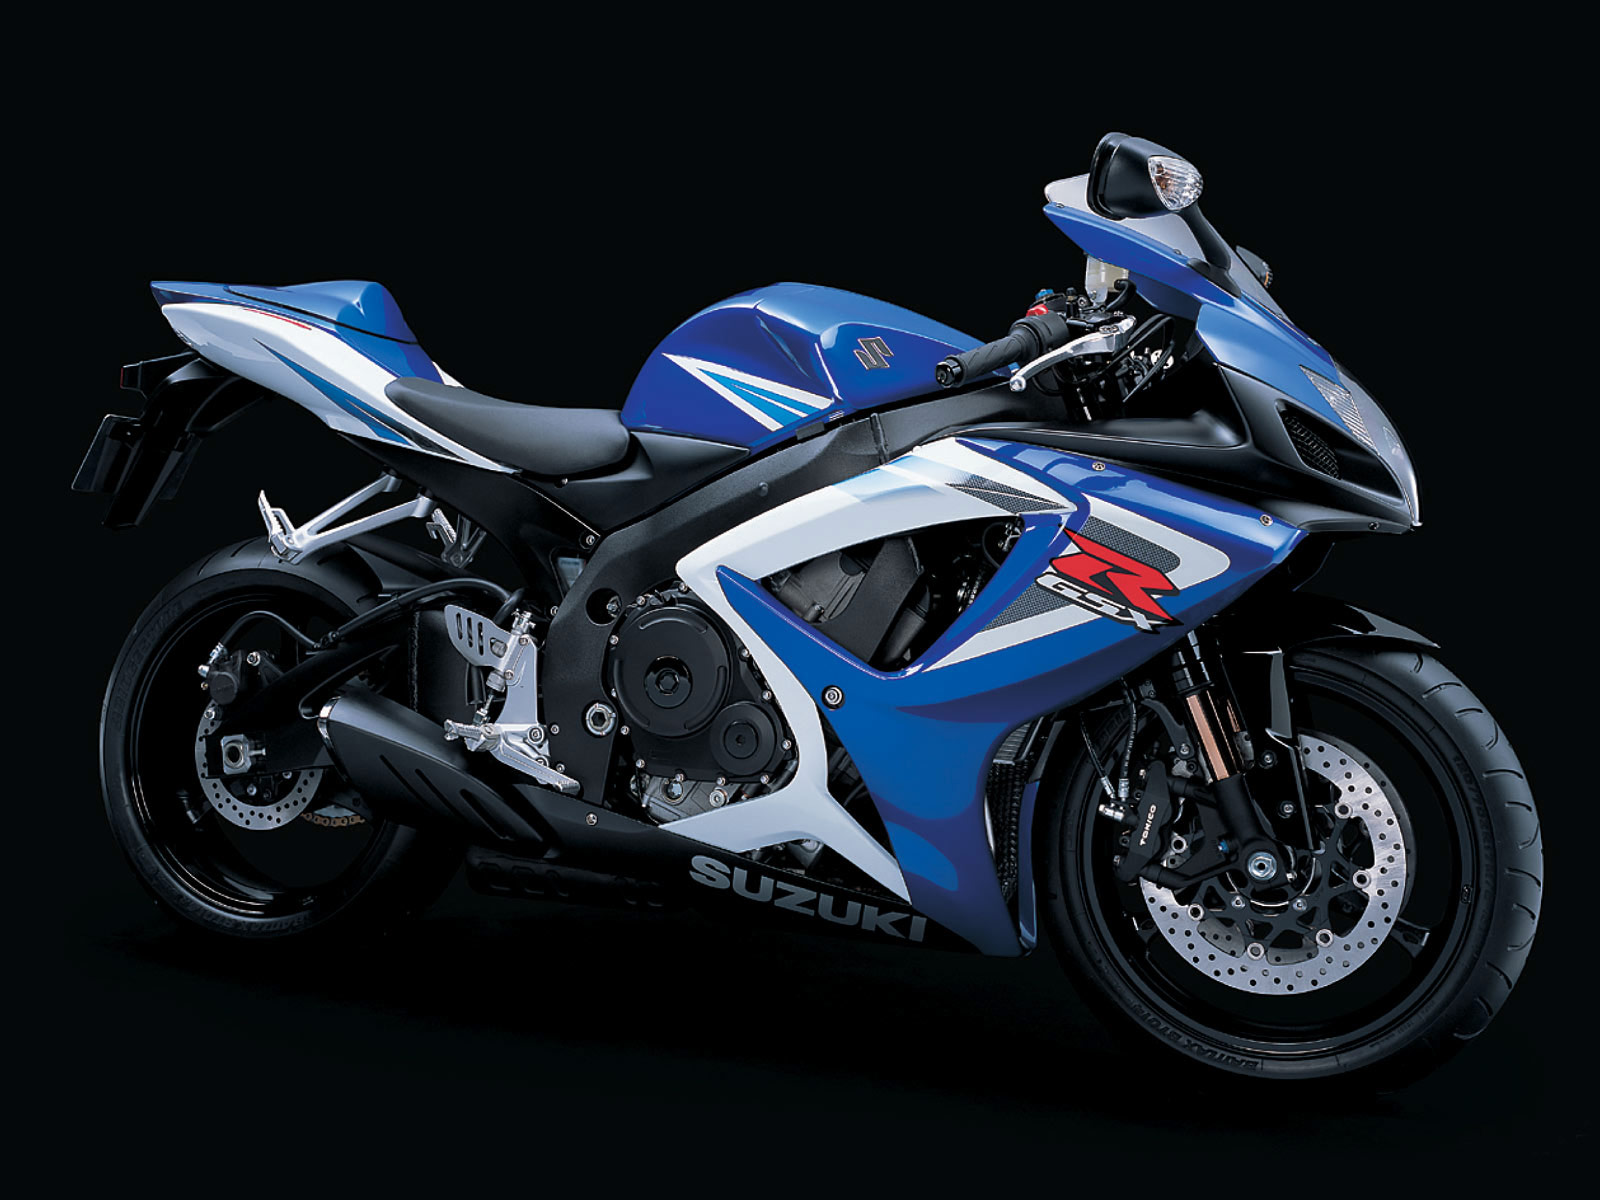 2006 Suzuki Gsx R 750 Motorcycle Accident Lawyers Info